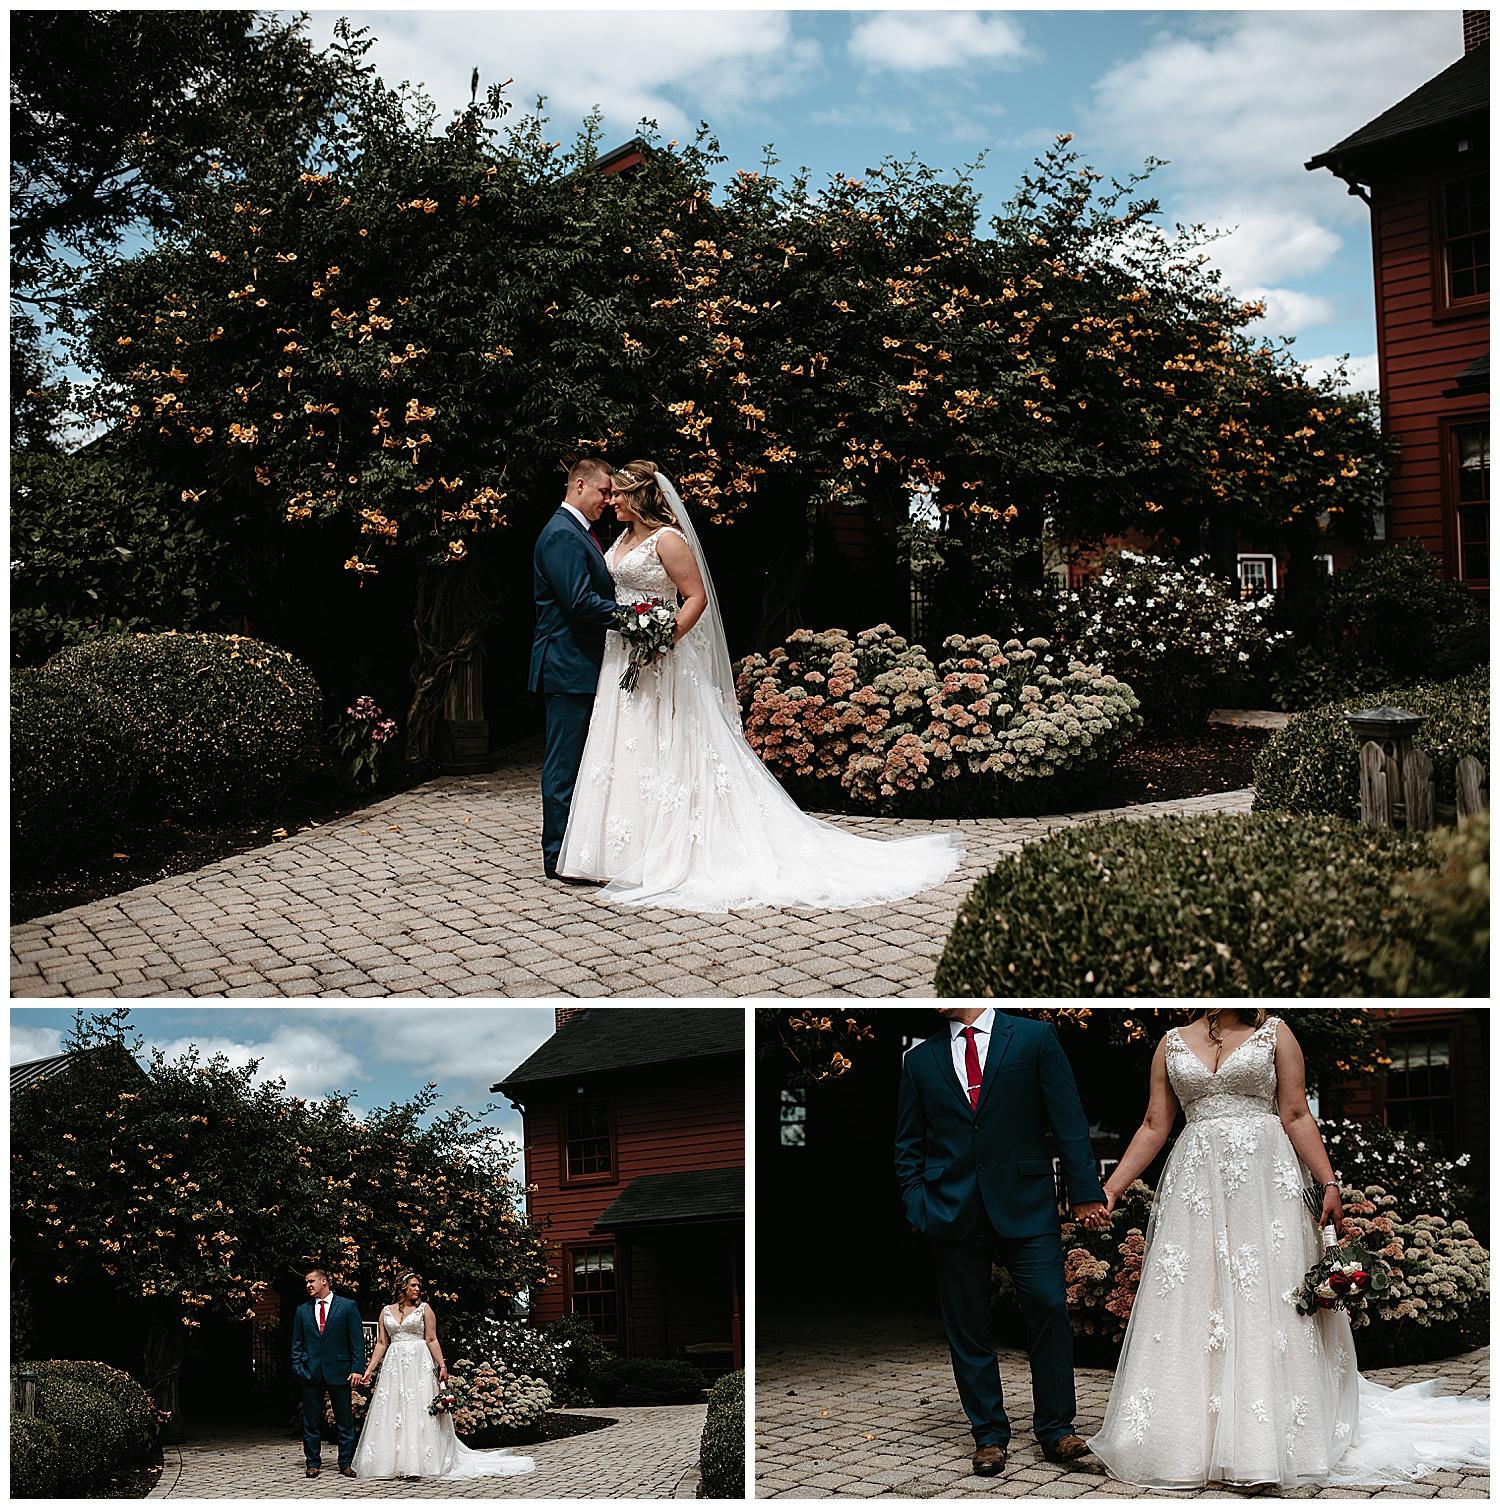 NEPA-Bloomgsburg-Wedding-Photographer-at-The-Barn-at-Greystone-Farms-Watsontown-PA_0038.jpg